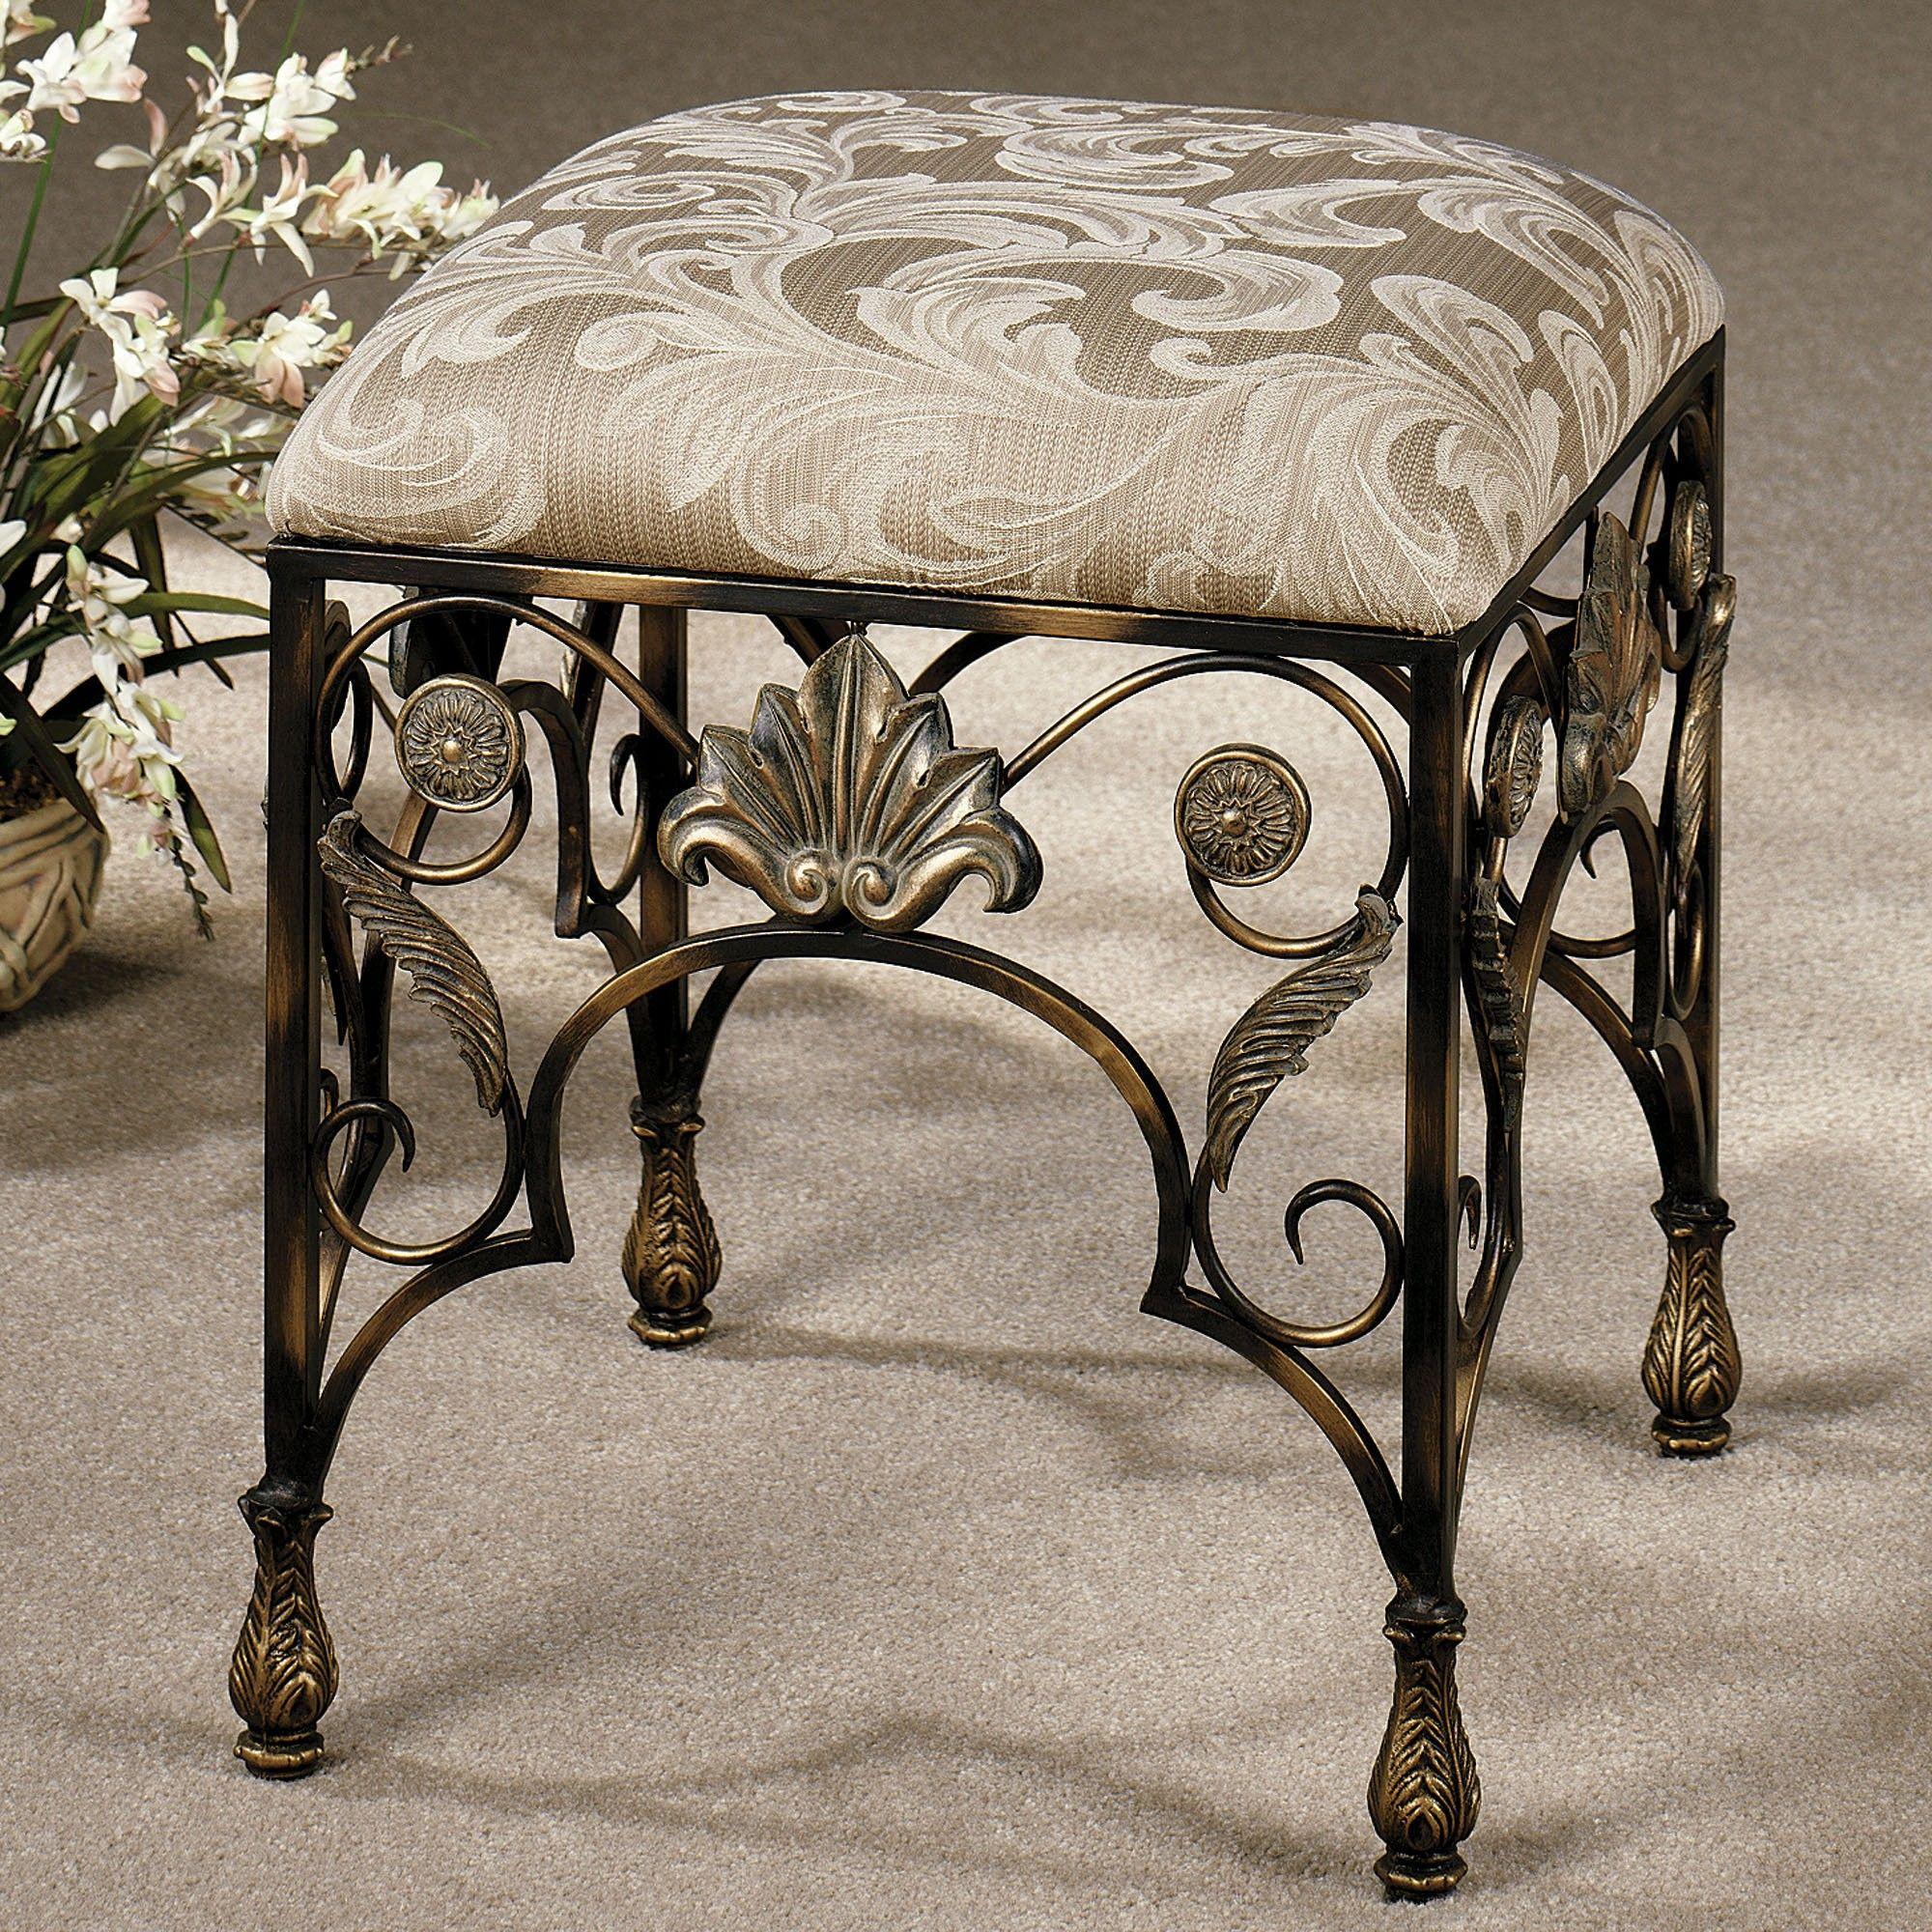 Bathroom Furniture Elegant Backless Vanity Chair With Ornate ...